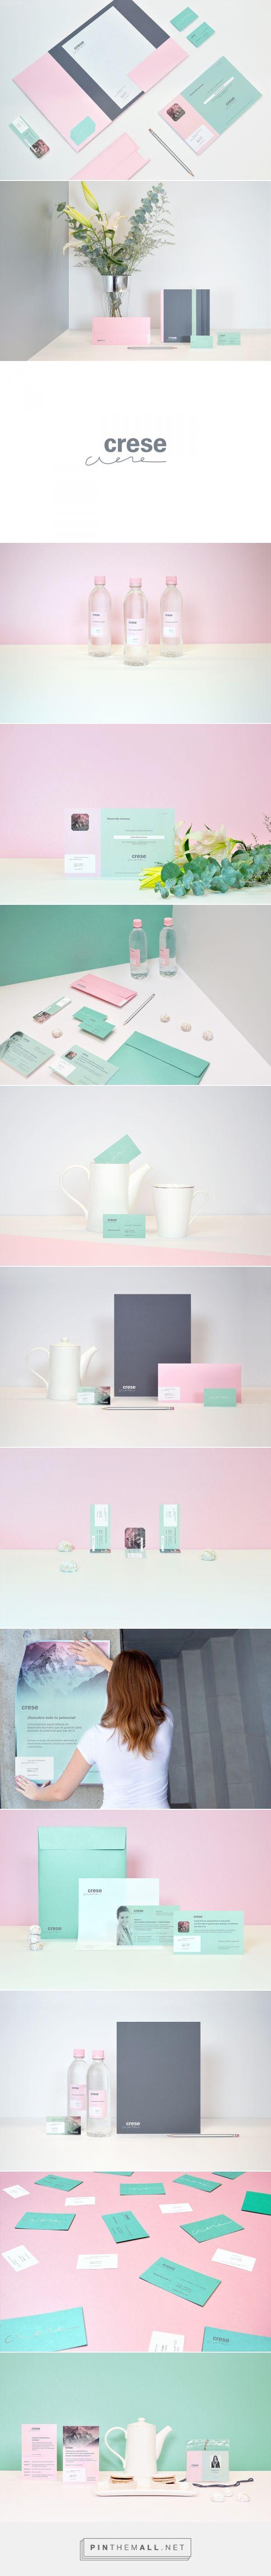 CRESE Branding by Open Studio by K on Behance | Fivestar Branding – Design and Branding Agency & Inspiration Gallery